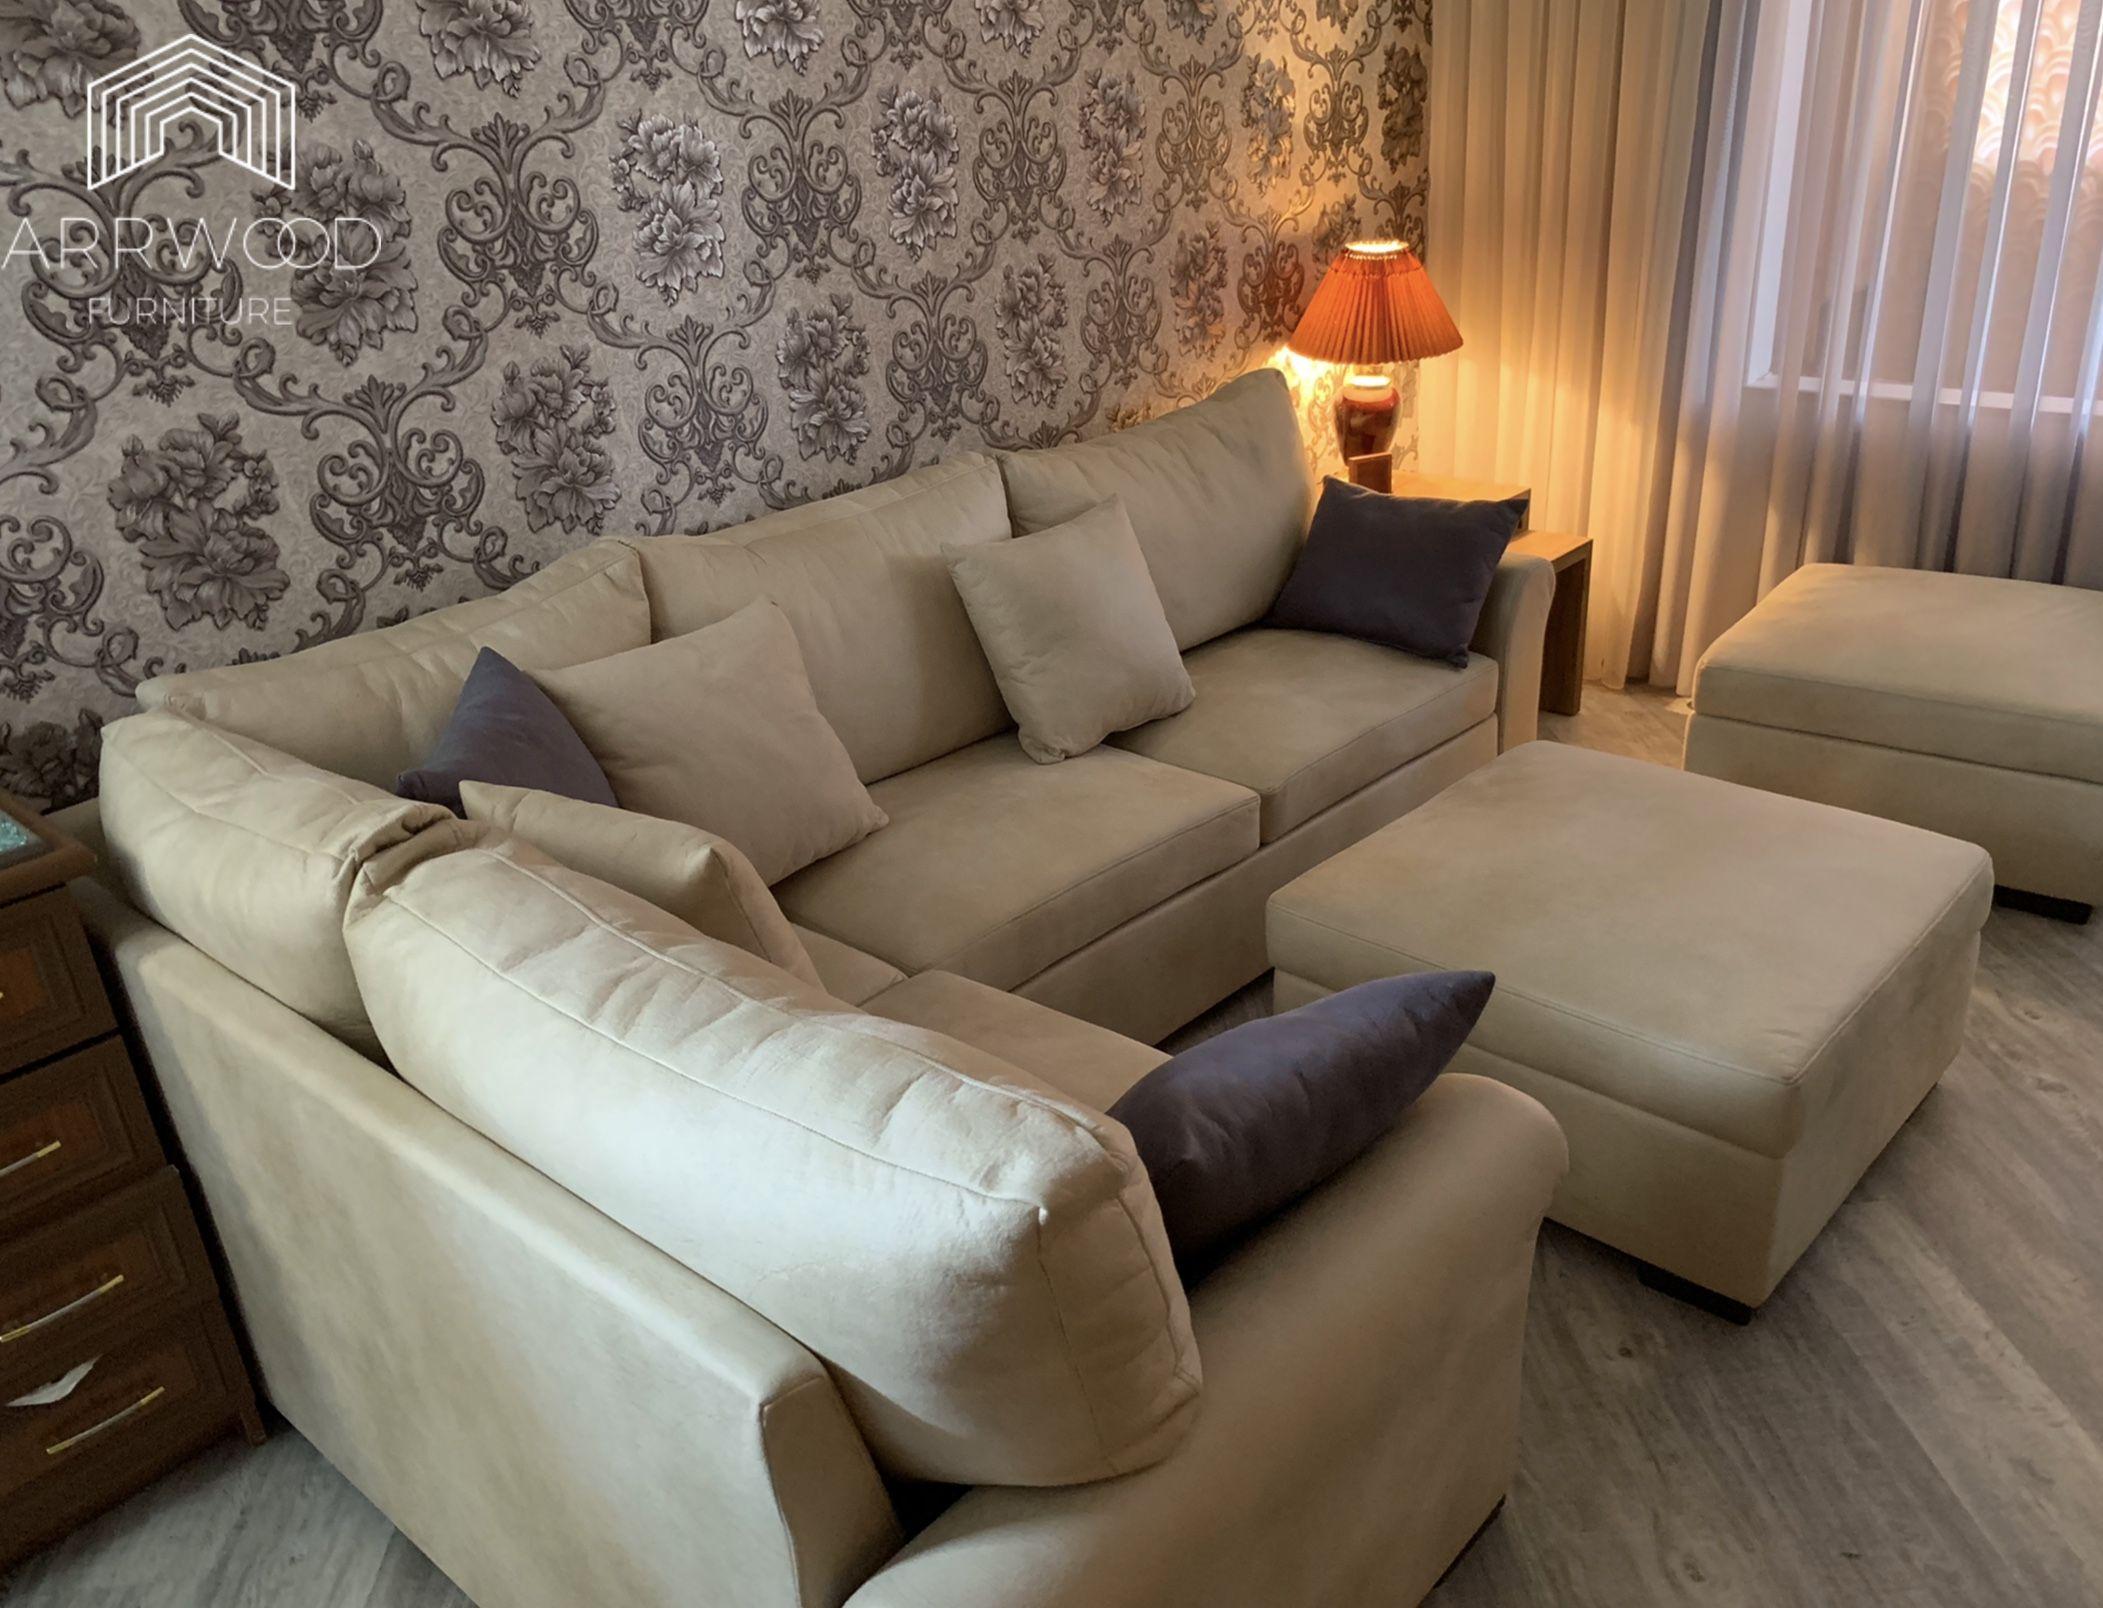 Sofa for living room #sofadesign #modernsofa #livingroom #livingroomdesigns #madeinarmenia #arrwood #furniture